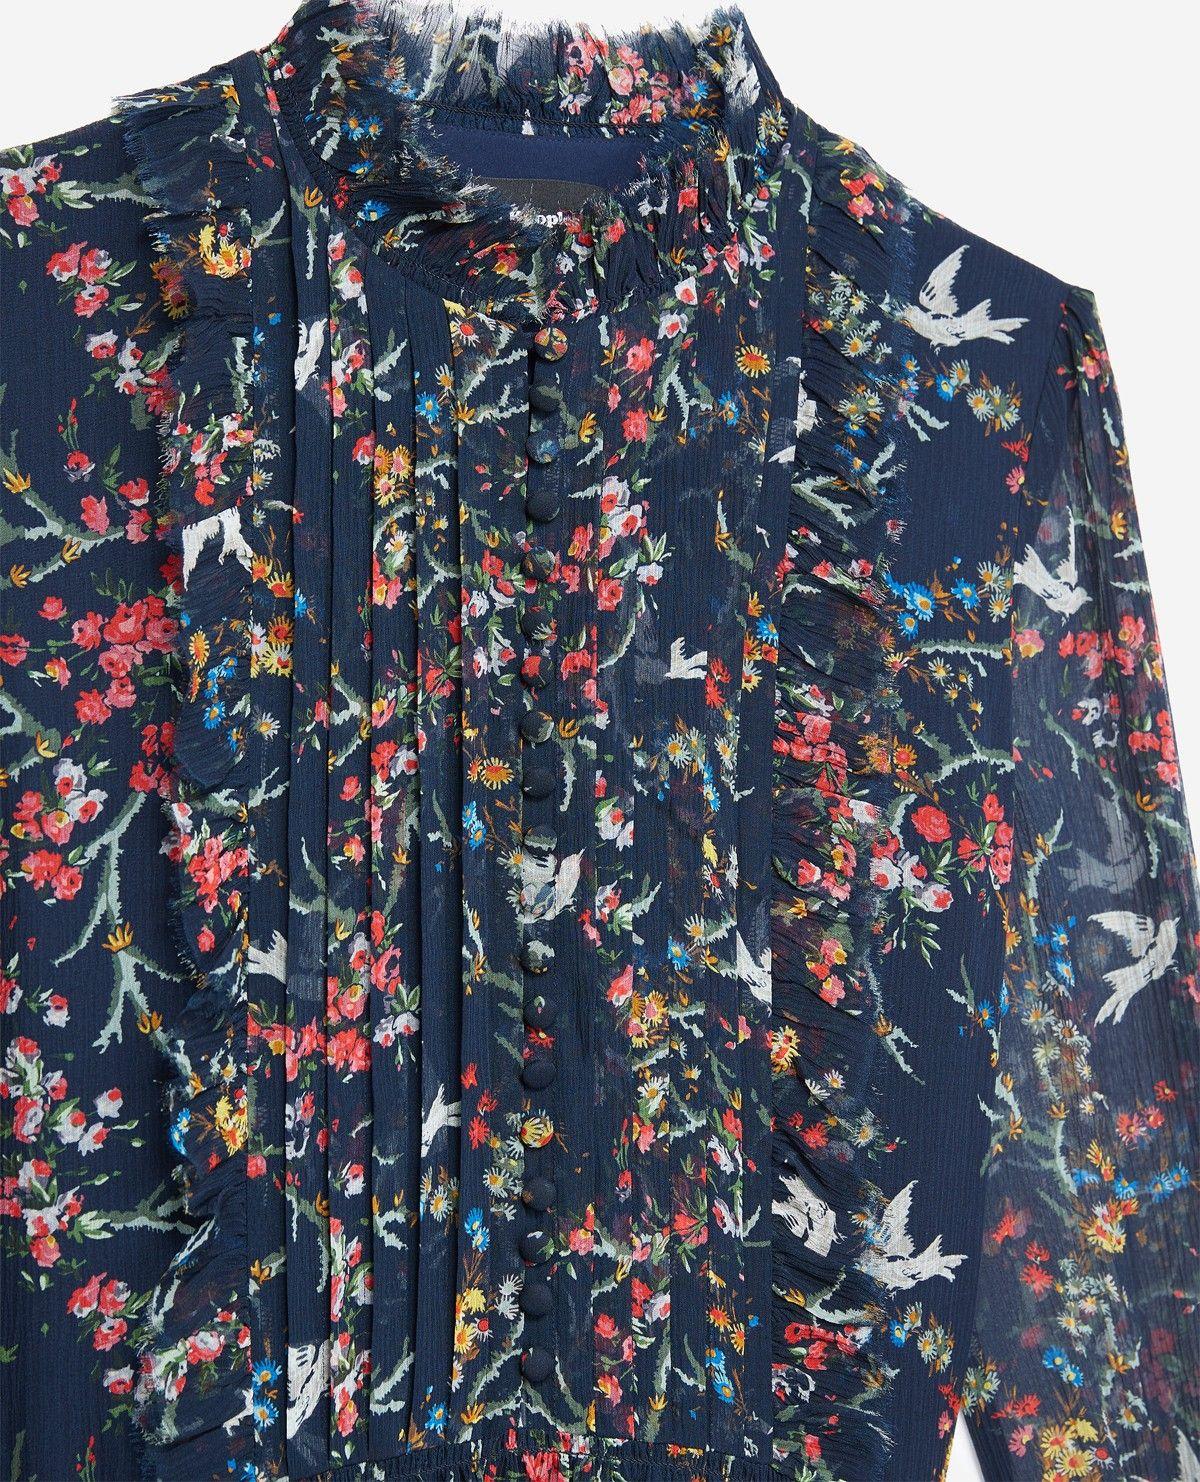 00235e321e1 Blue Bird black dress in silk - Collection THE KOOPLES | Spring 2019 ...